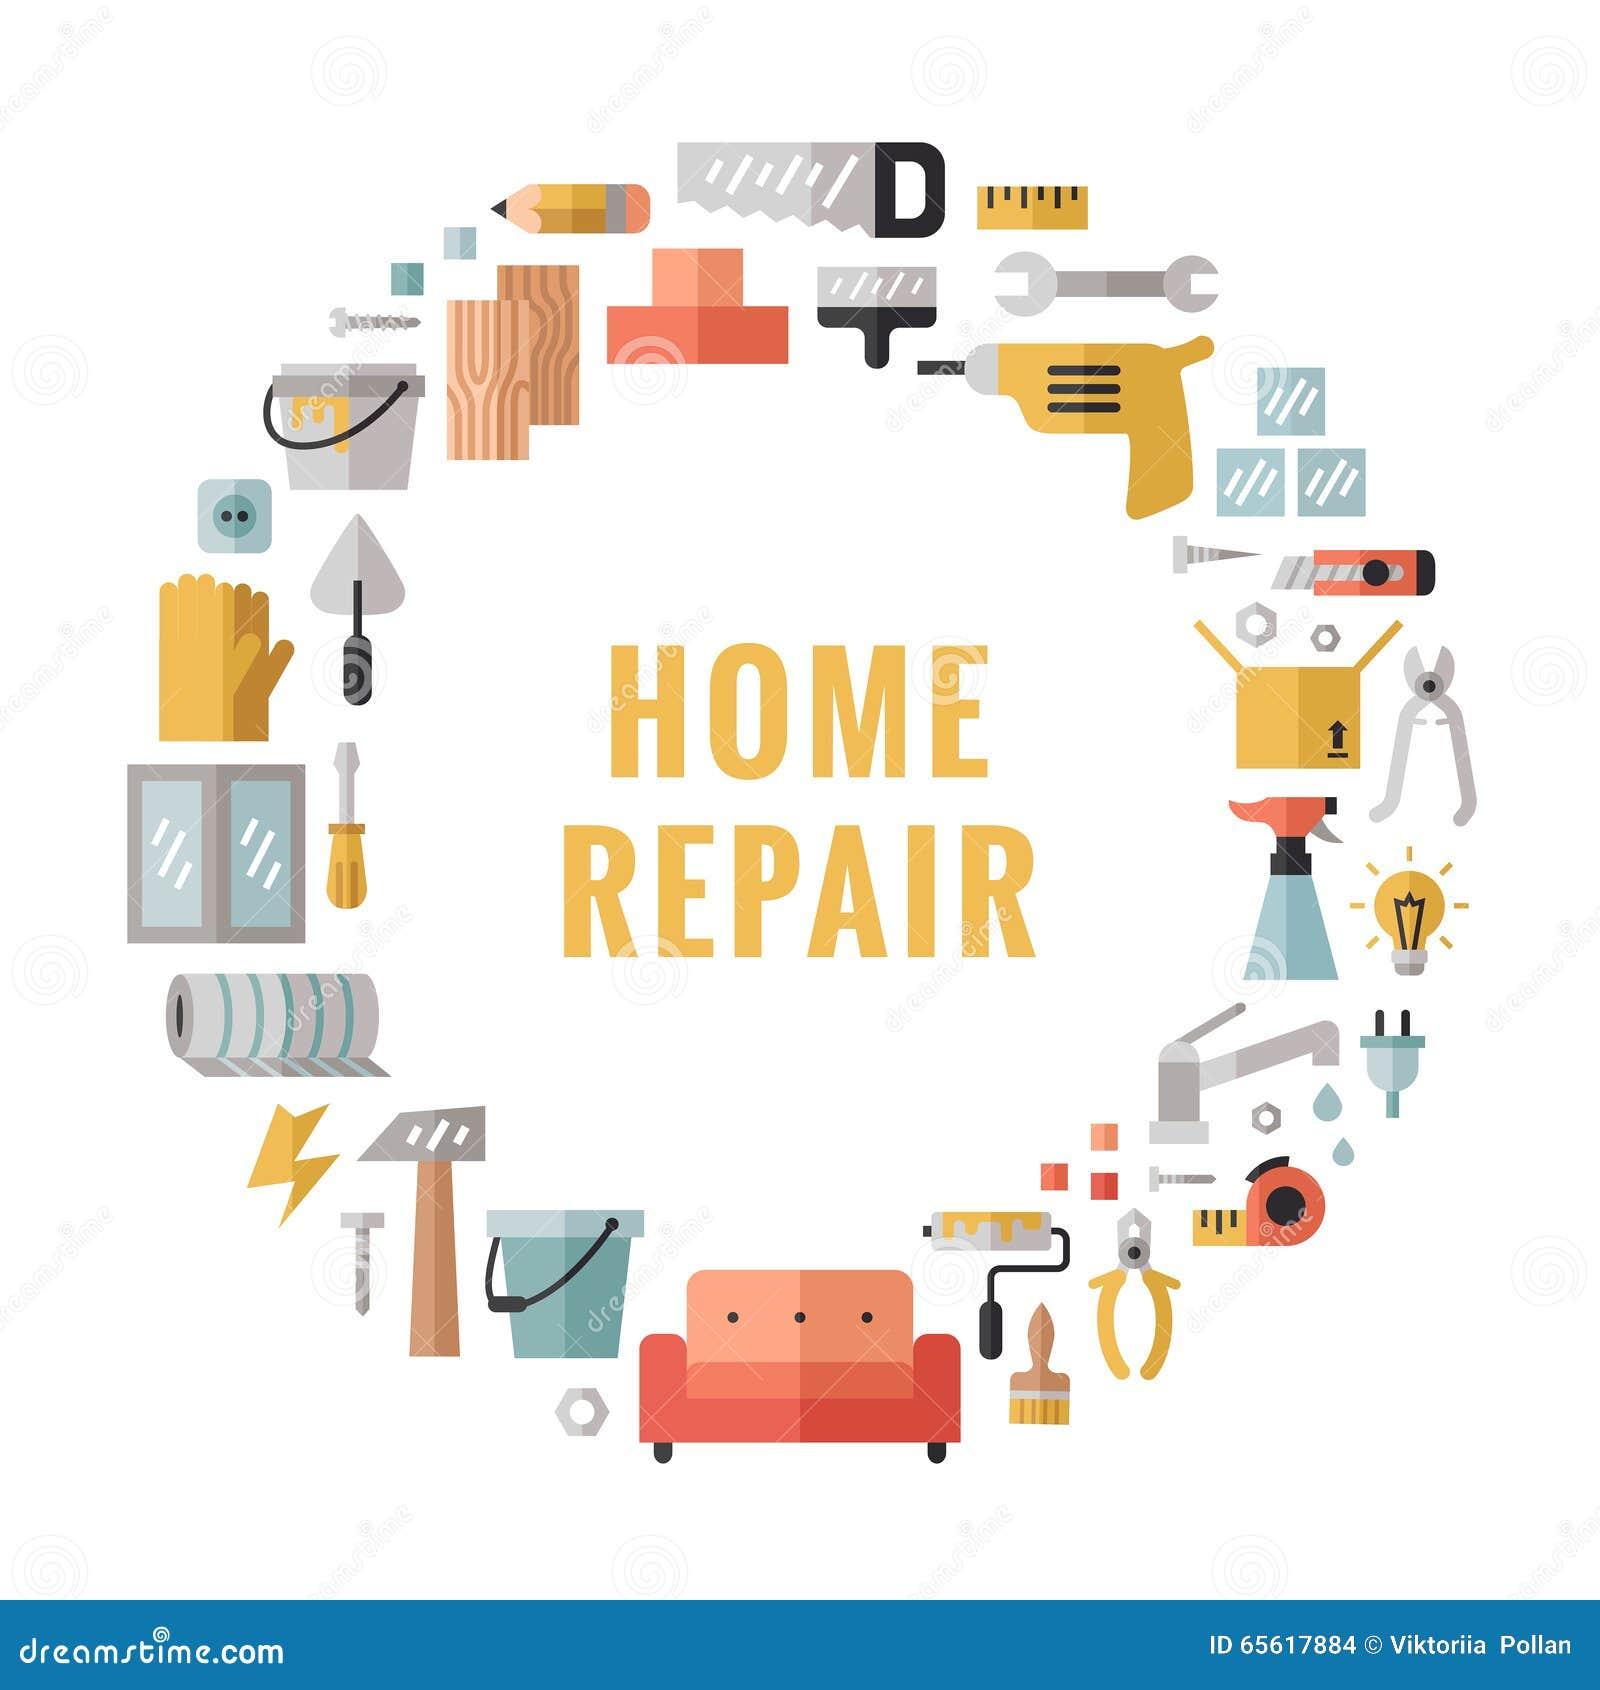 Home Repair Icons Flat Cartoon Vector